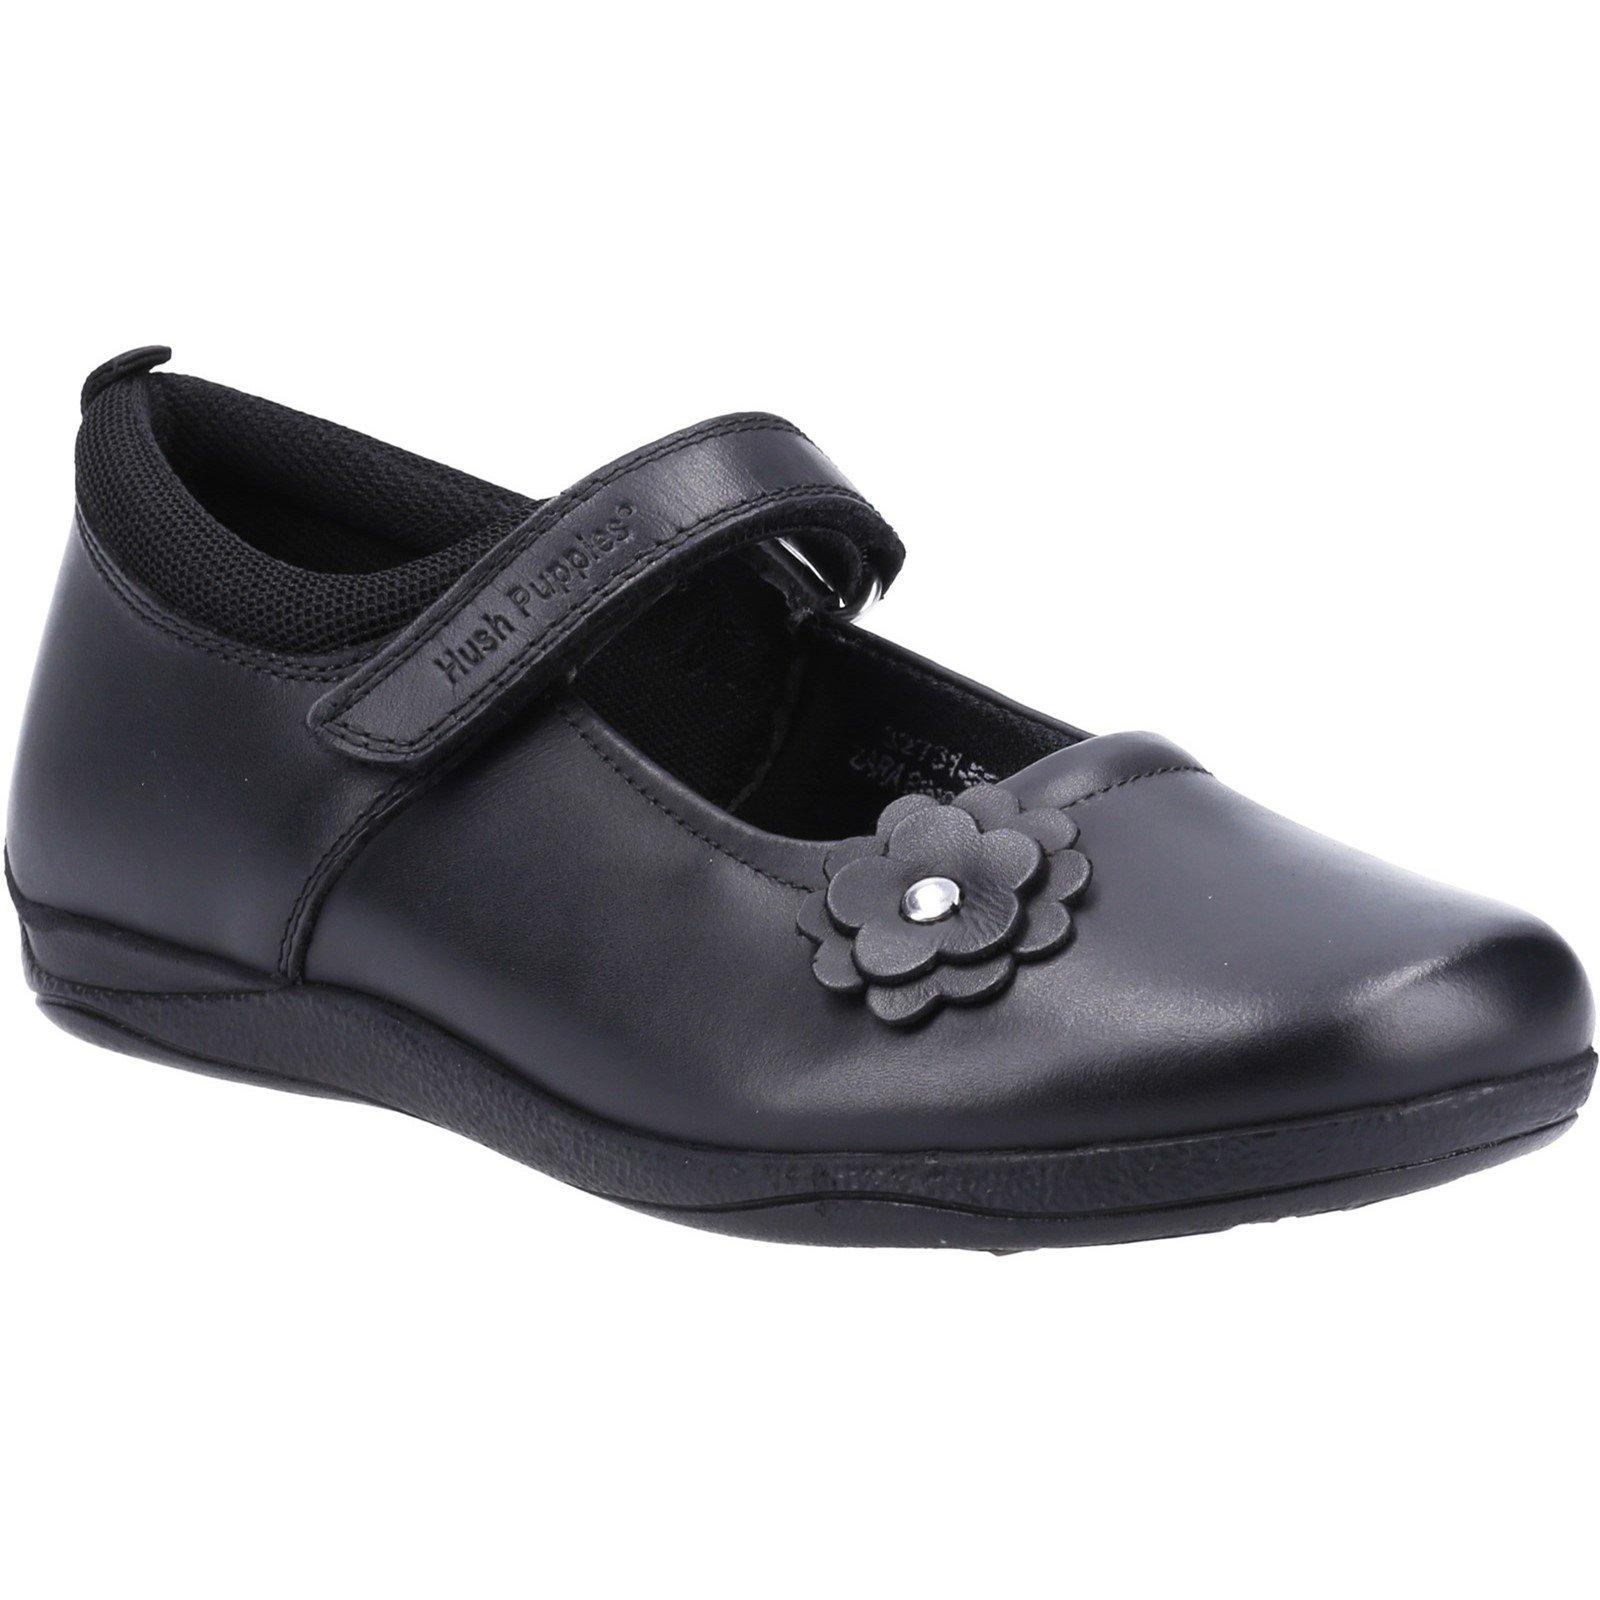 Hush Puppies Kid's Zara Senior School Flat Shoe Black 32732 - Black 3